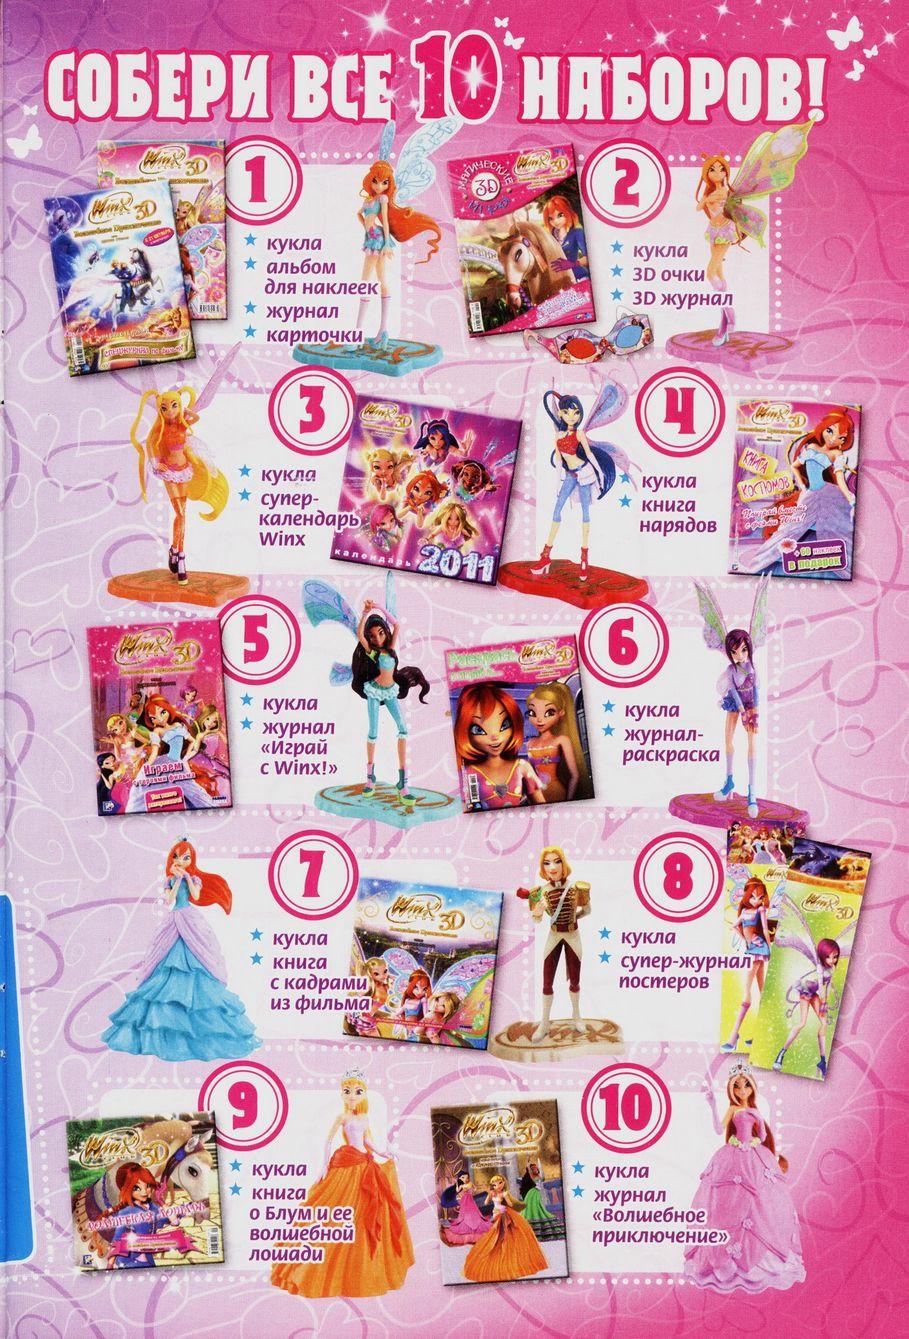 Комикс Винкс Winx - Волшебник Камуд (Журнал Винкс №6 2011) - стр. 3